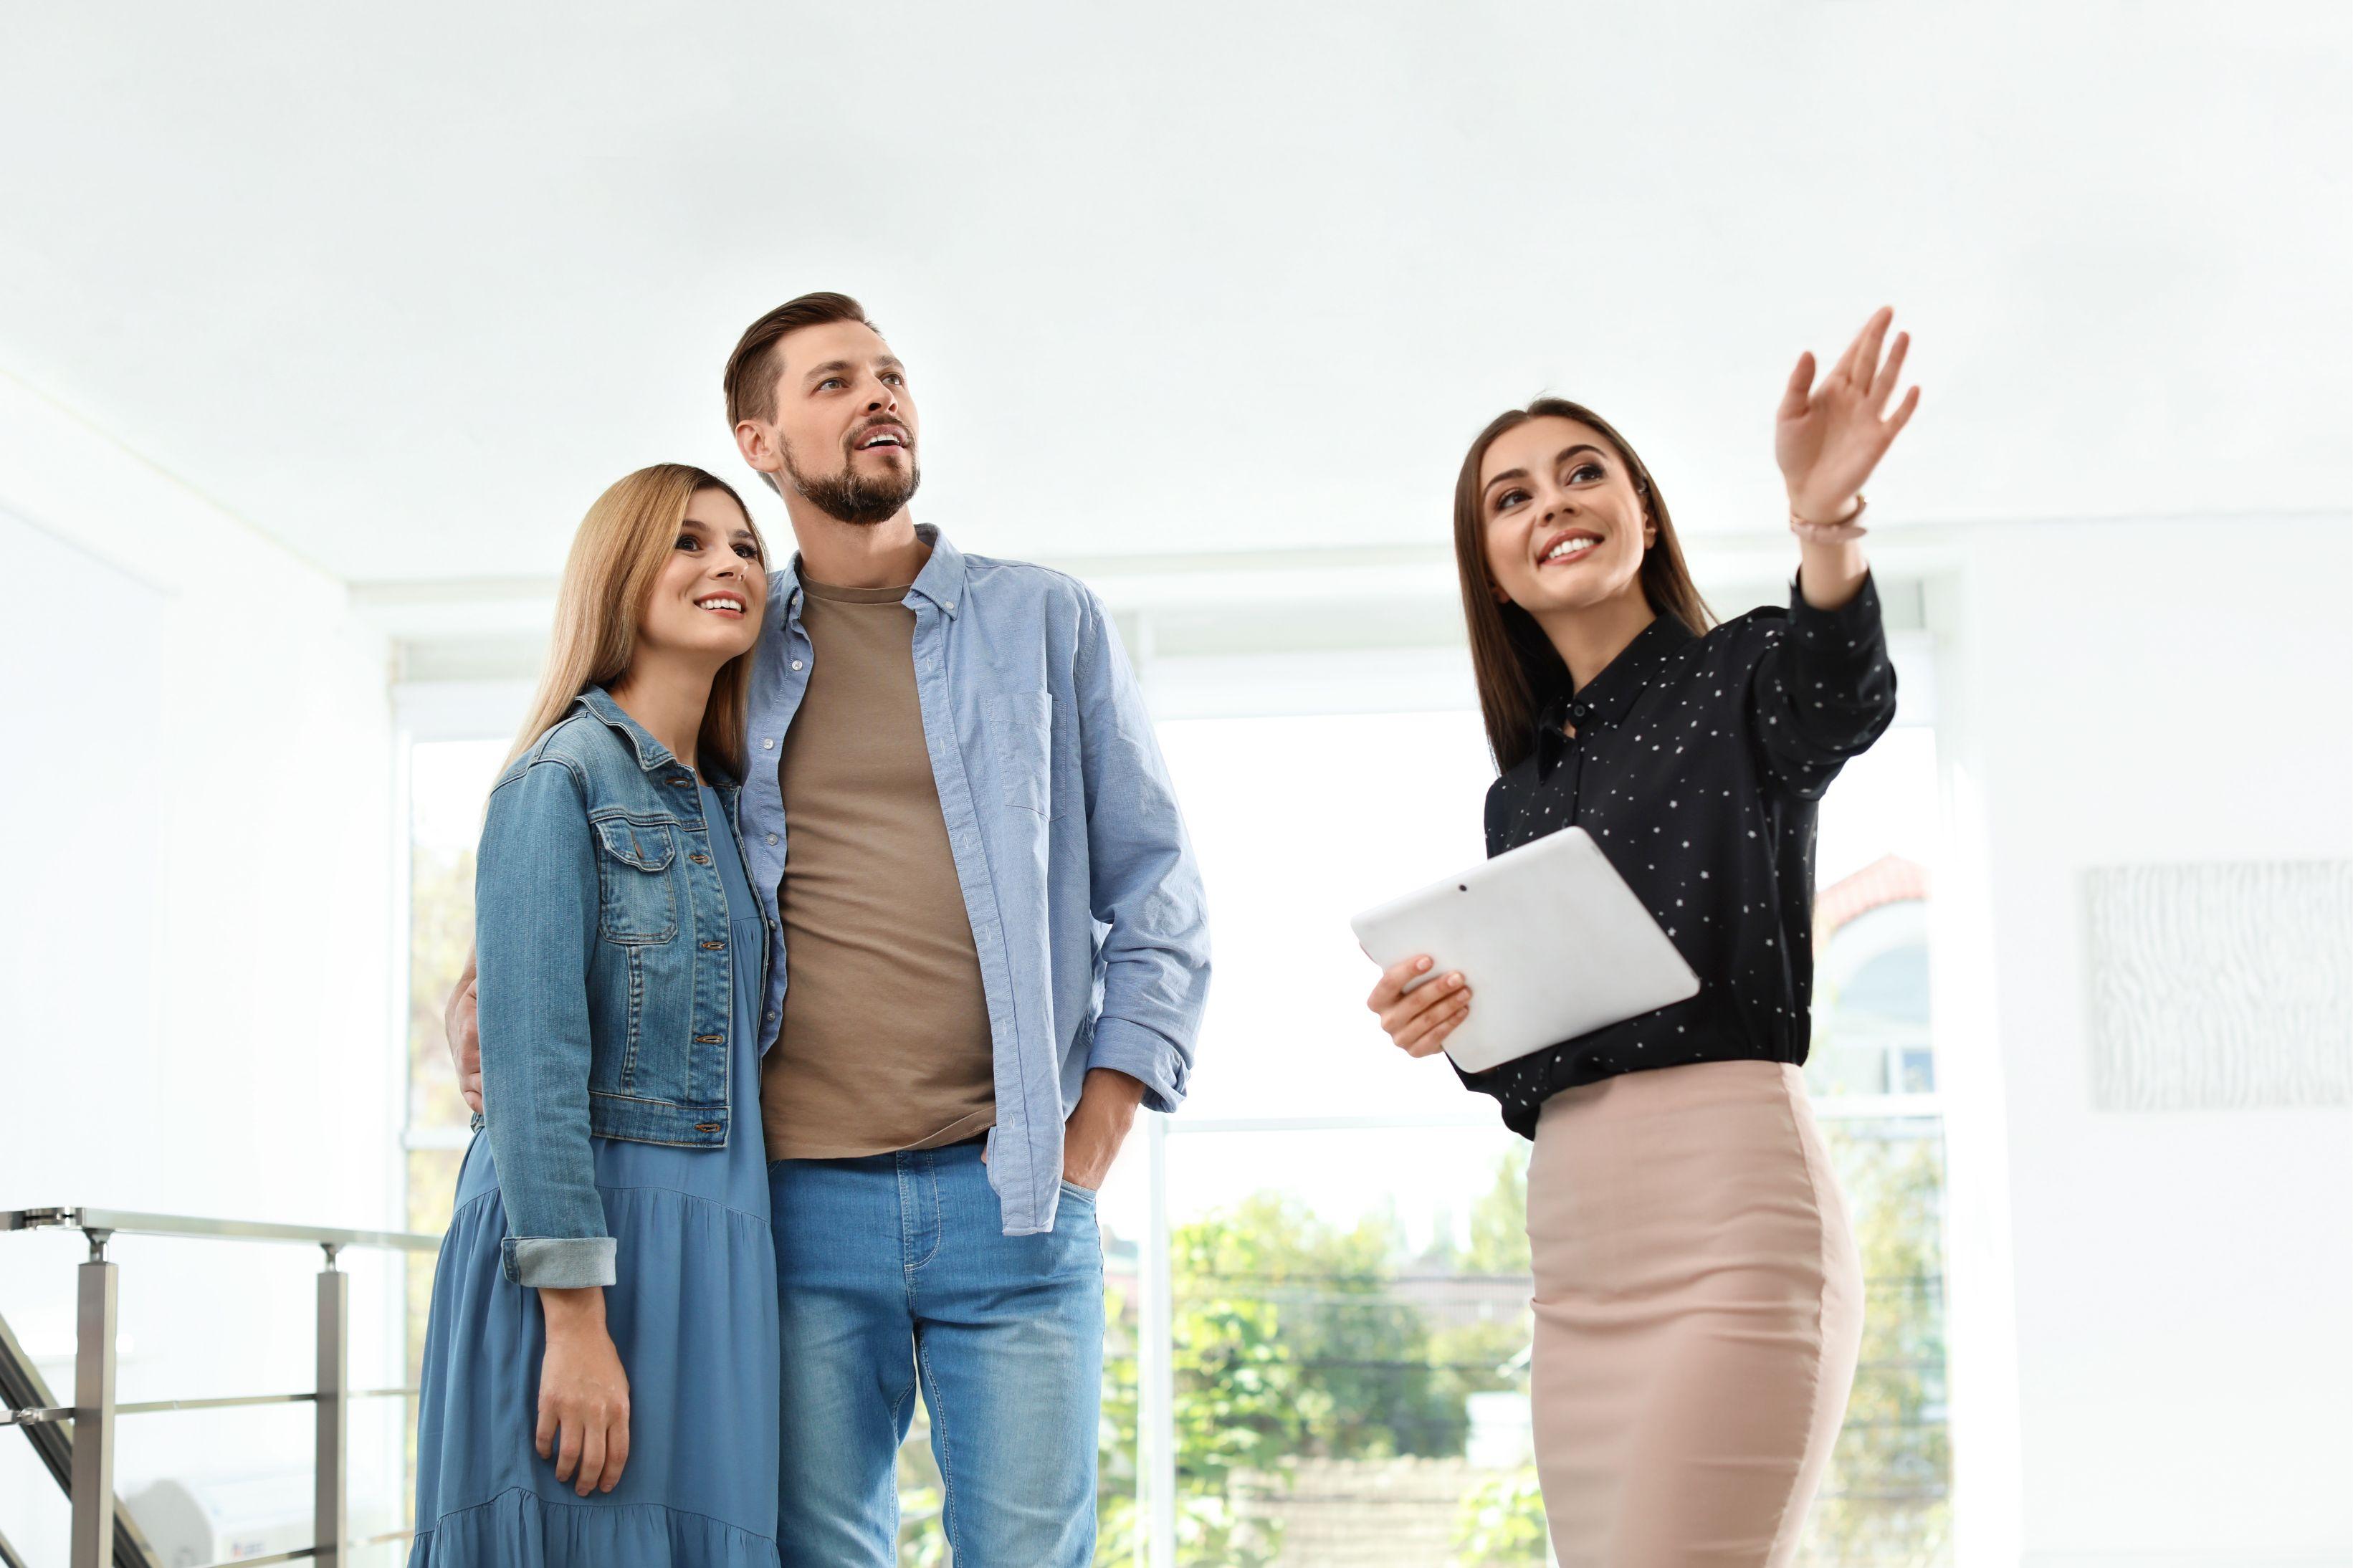 agent-immobilier-popularite